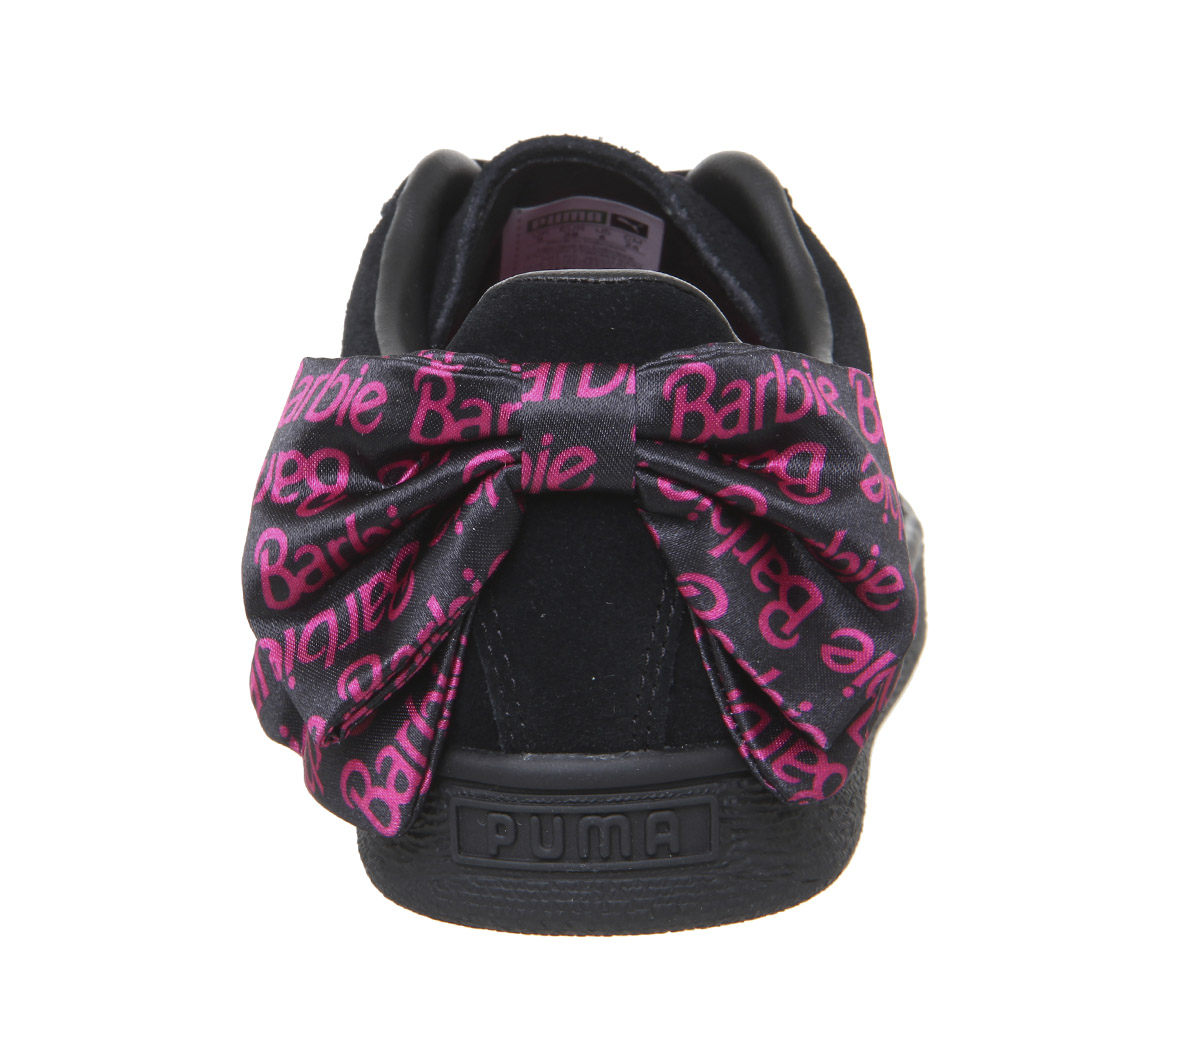 666febd807a1b SENTINEL Donna Puma Suede Classic allenatori Barbie Team formatori nero oro  scarpe